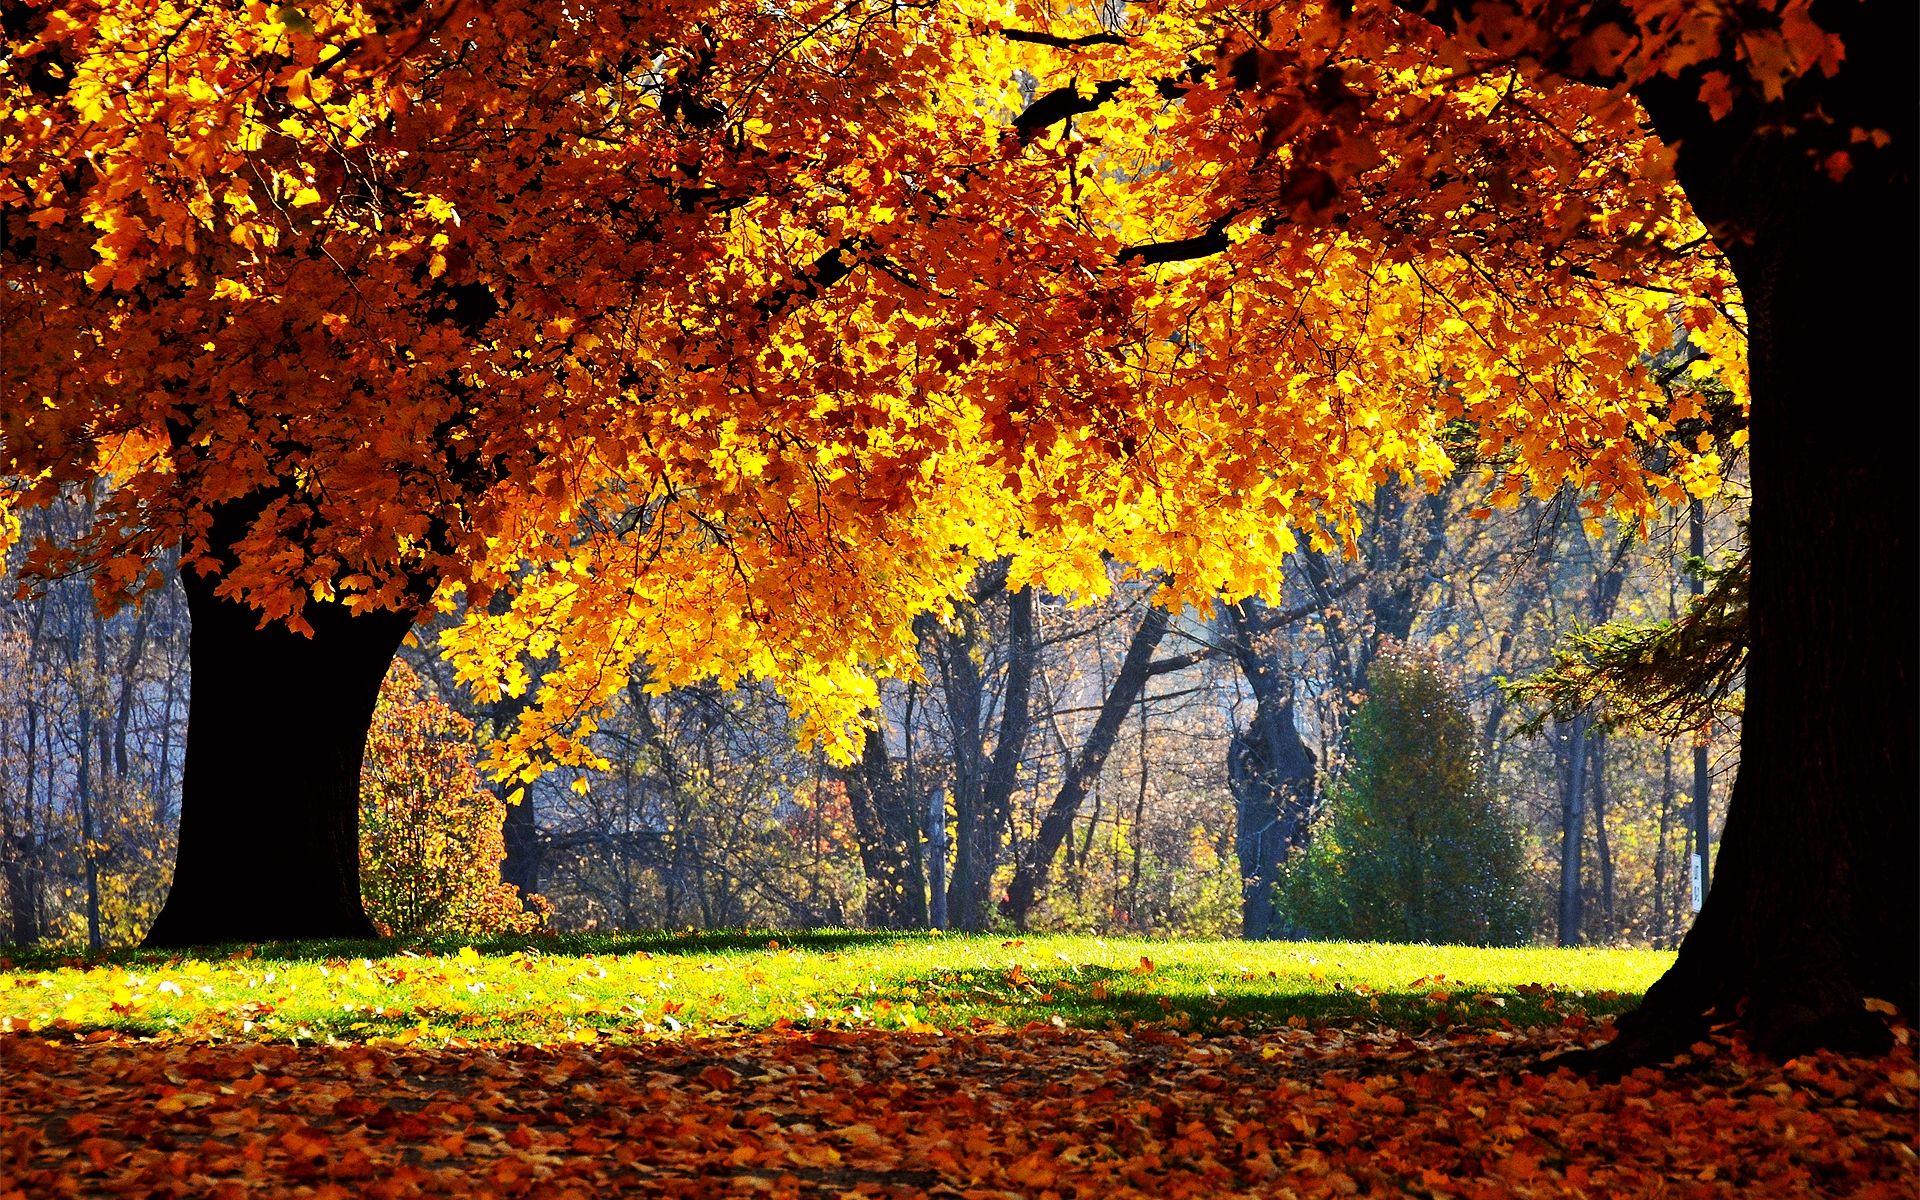 Venlenis おしゃれまとめの人気アイデア Pinterest Kay 風景の壁紙 秋の風景 秋の壁紙